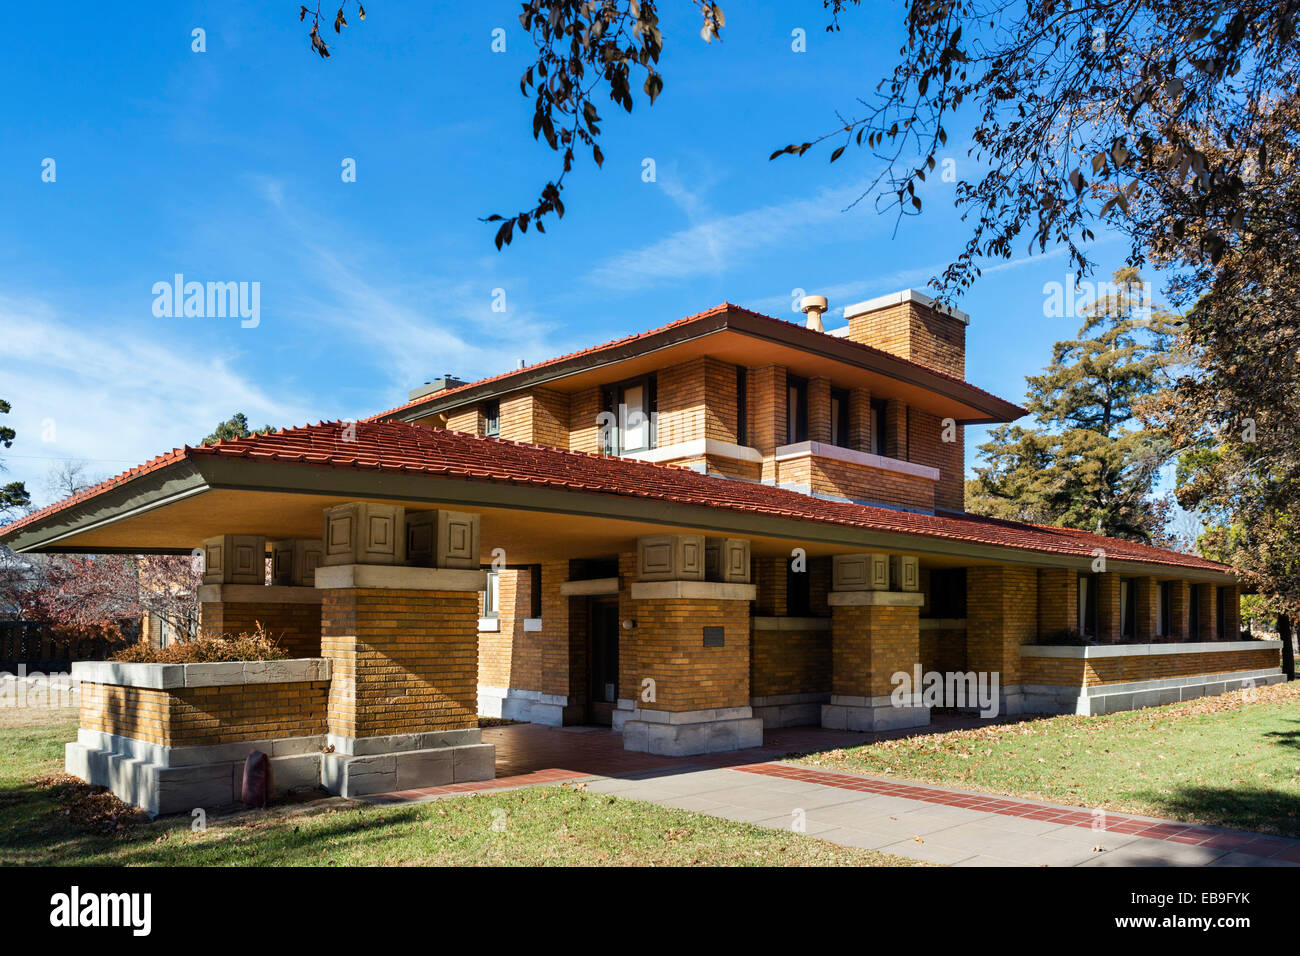 Frank Lloyd Wright entworfen, Allen-Lambe House, 255 N Roosevelt Street, Wichita, Kansas, USA Stockbild